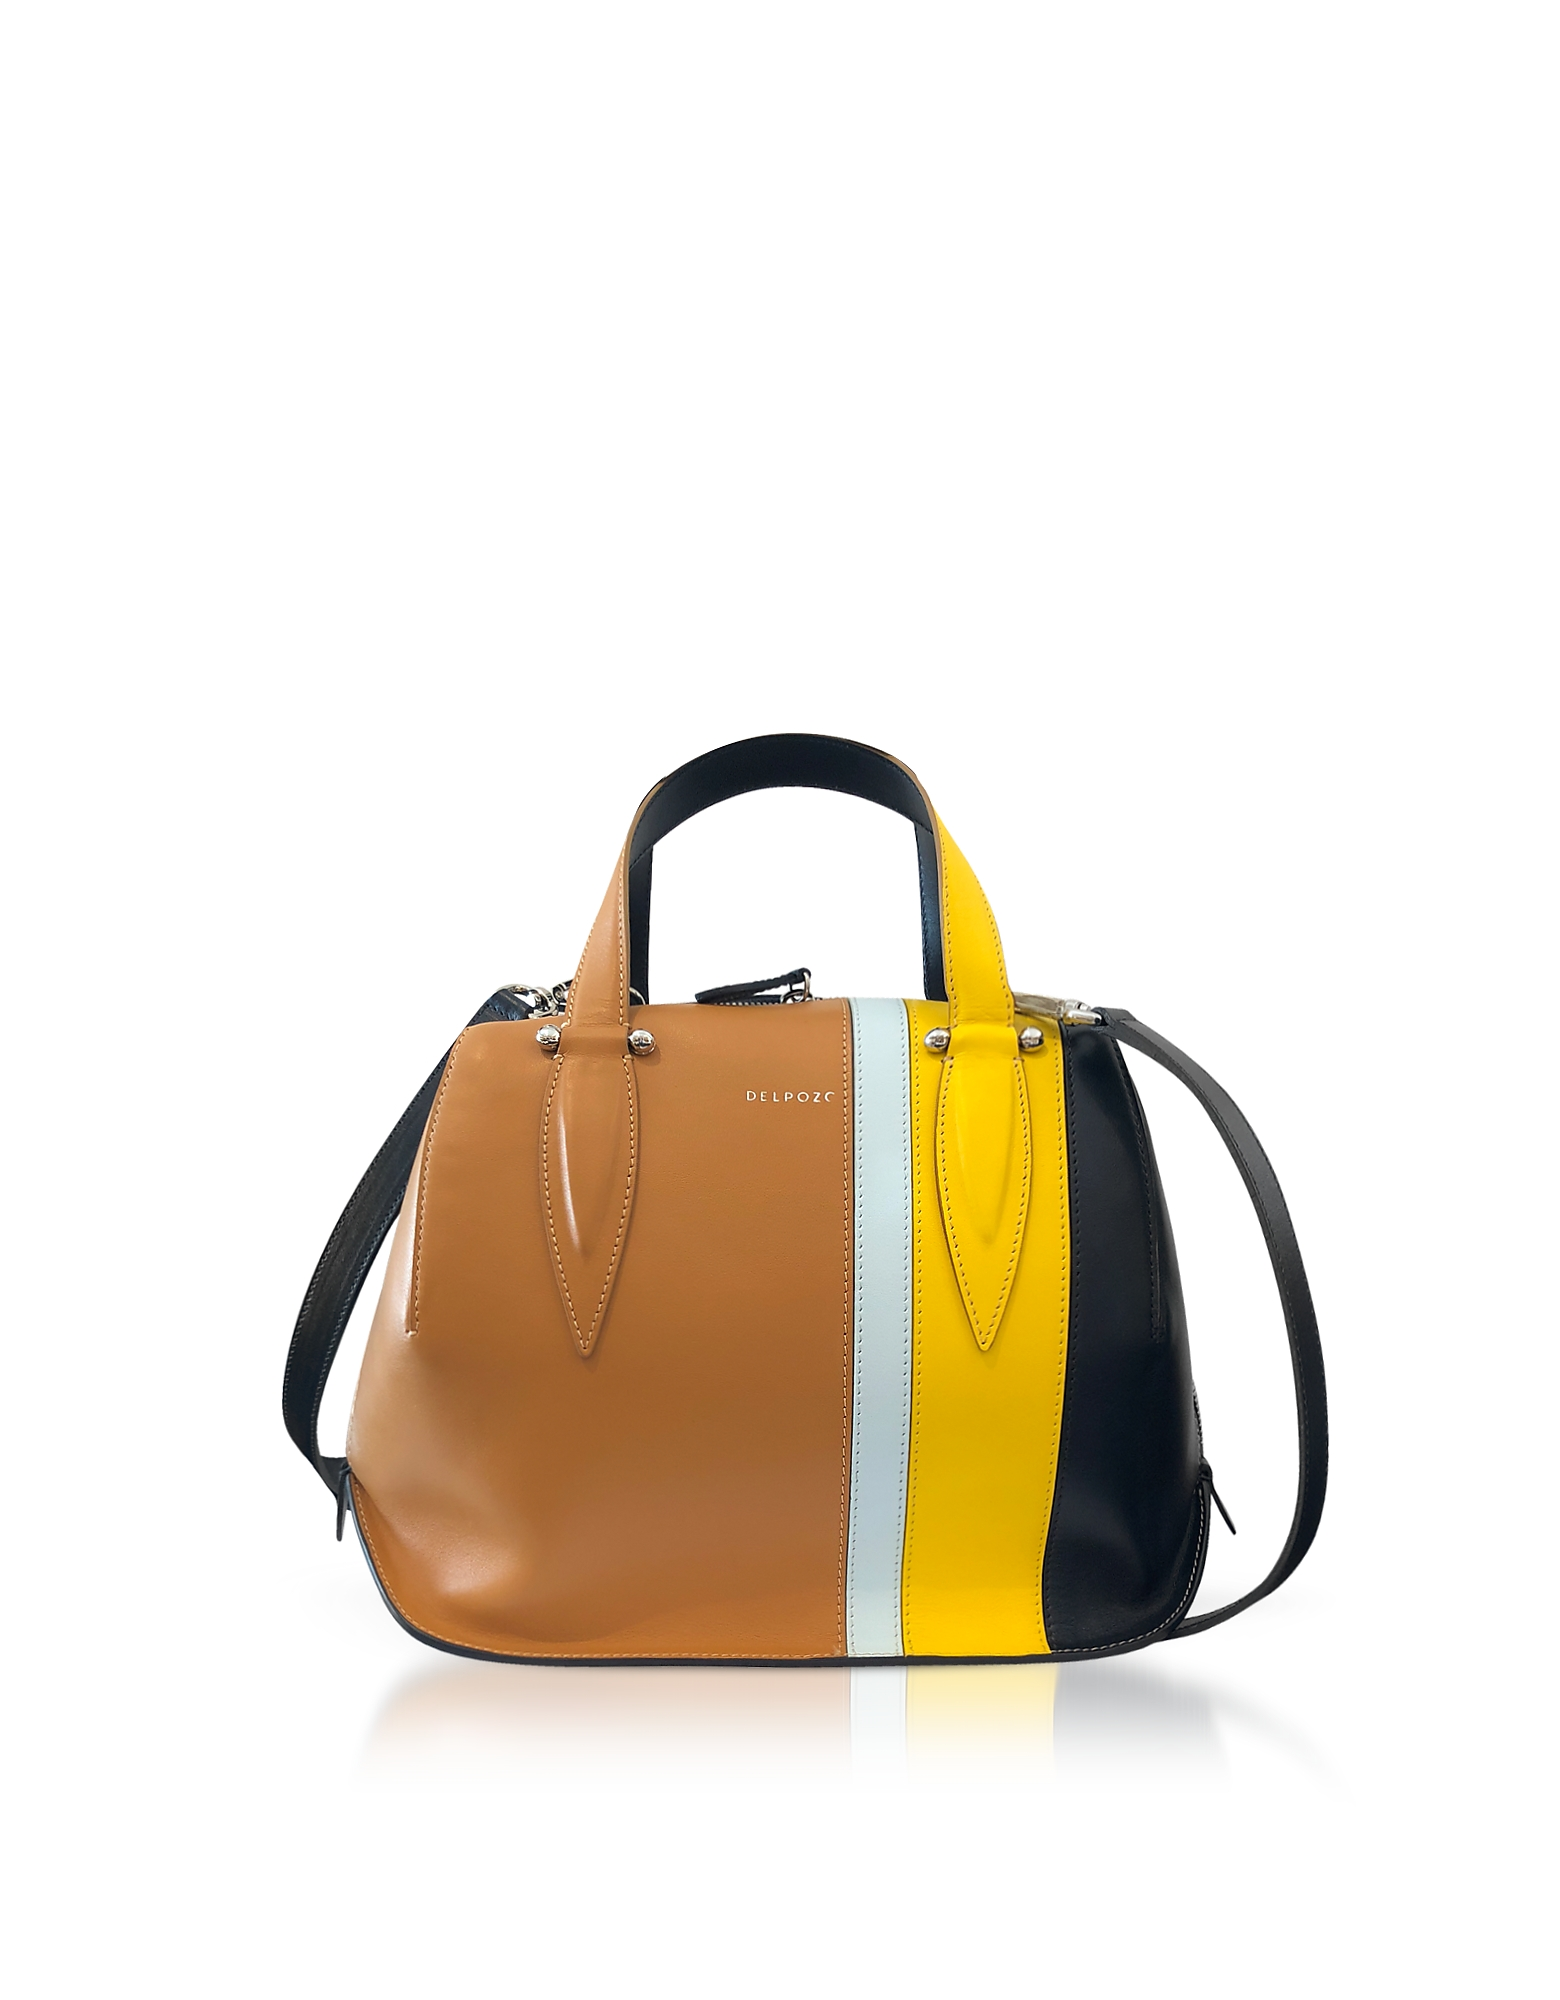 Image of Delpozo Designer Handbags, Small Benedetta Bag